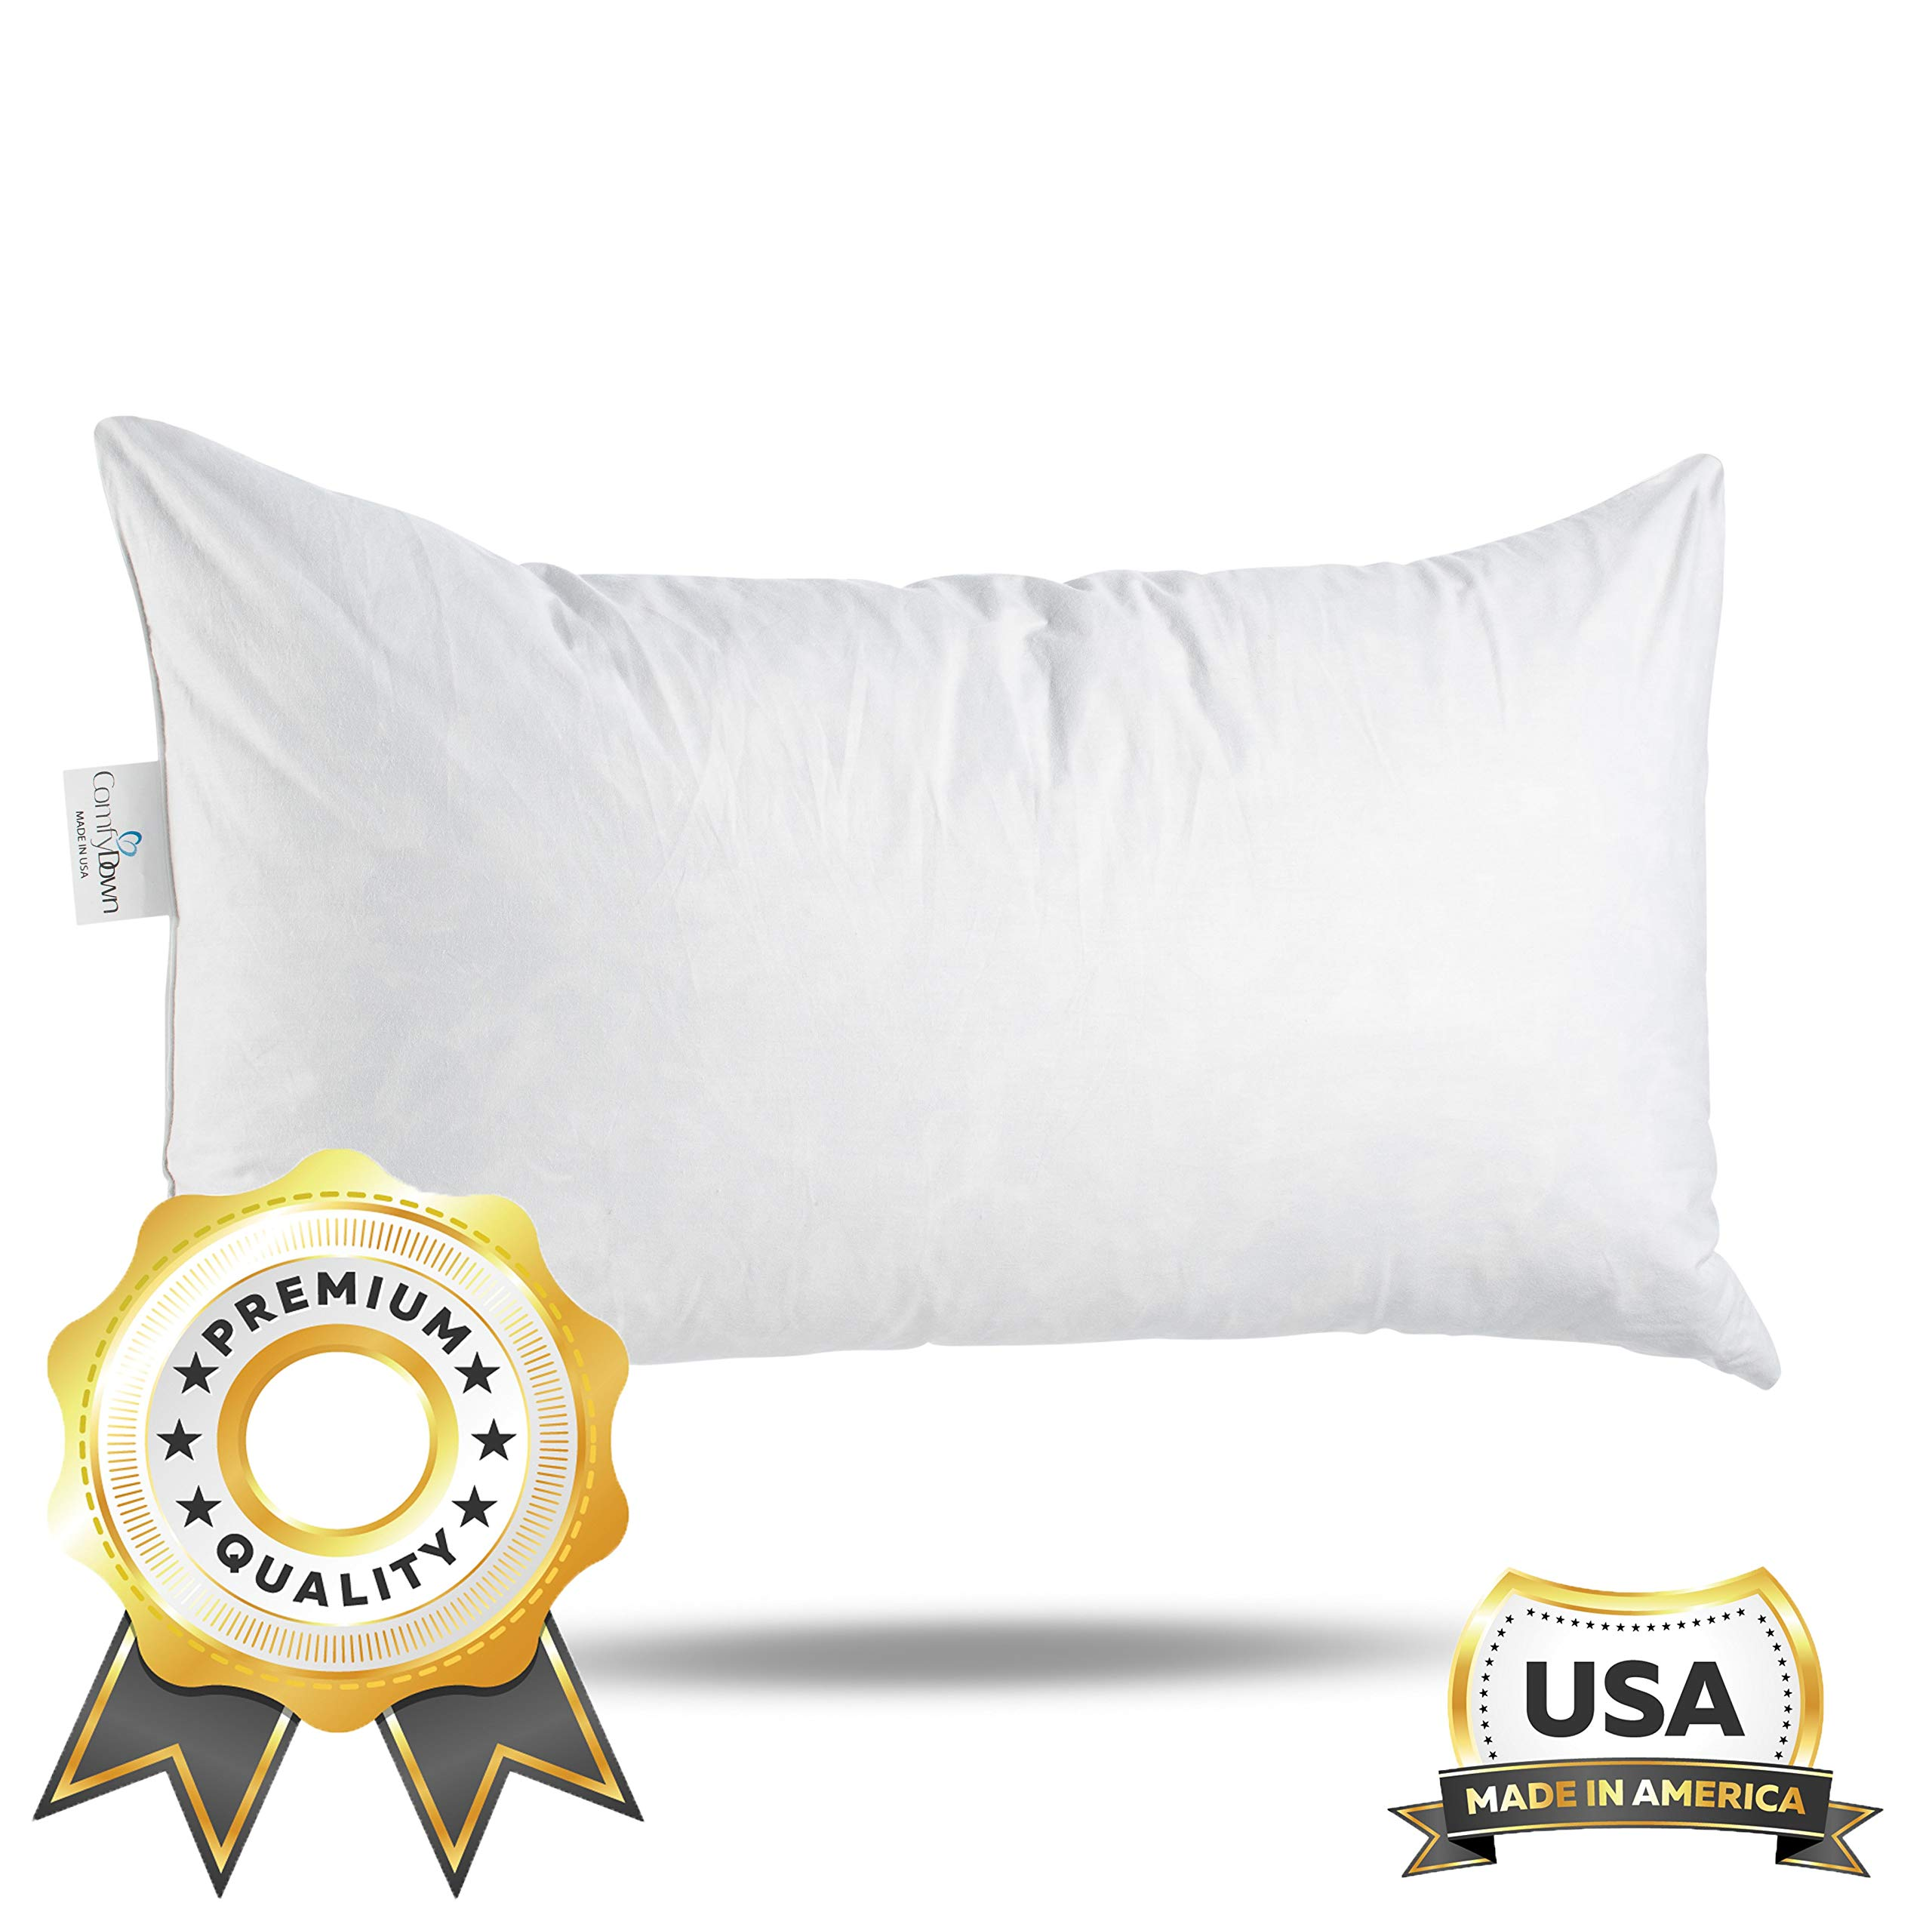 comfydown 95 feather 5 down 12 x 18 rectangle decorative pillow insert sham stuffer made in usa walmart com